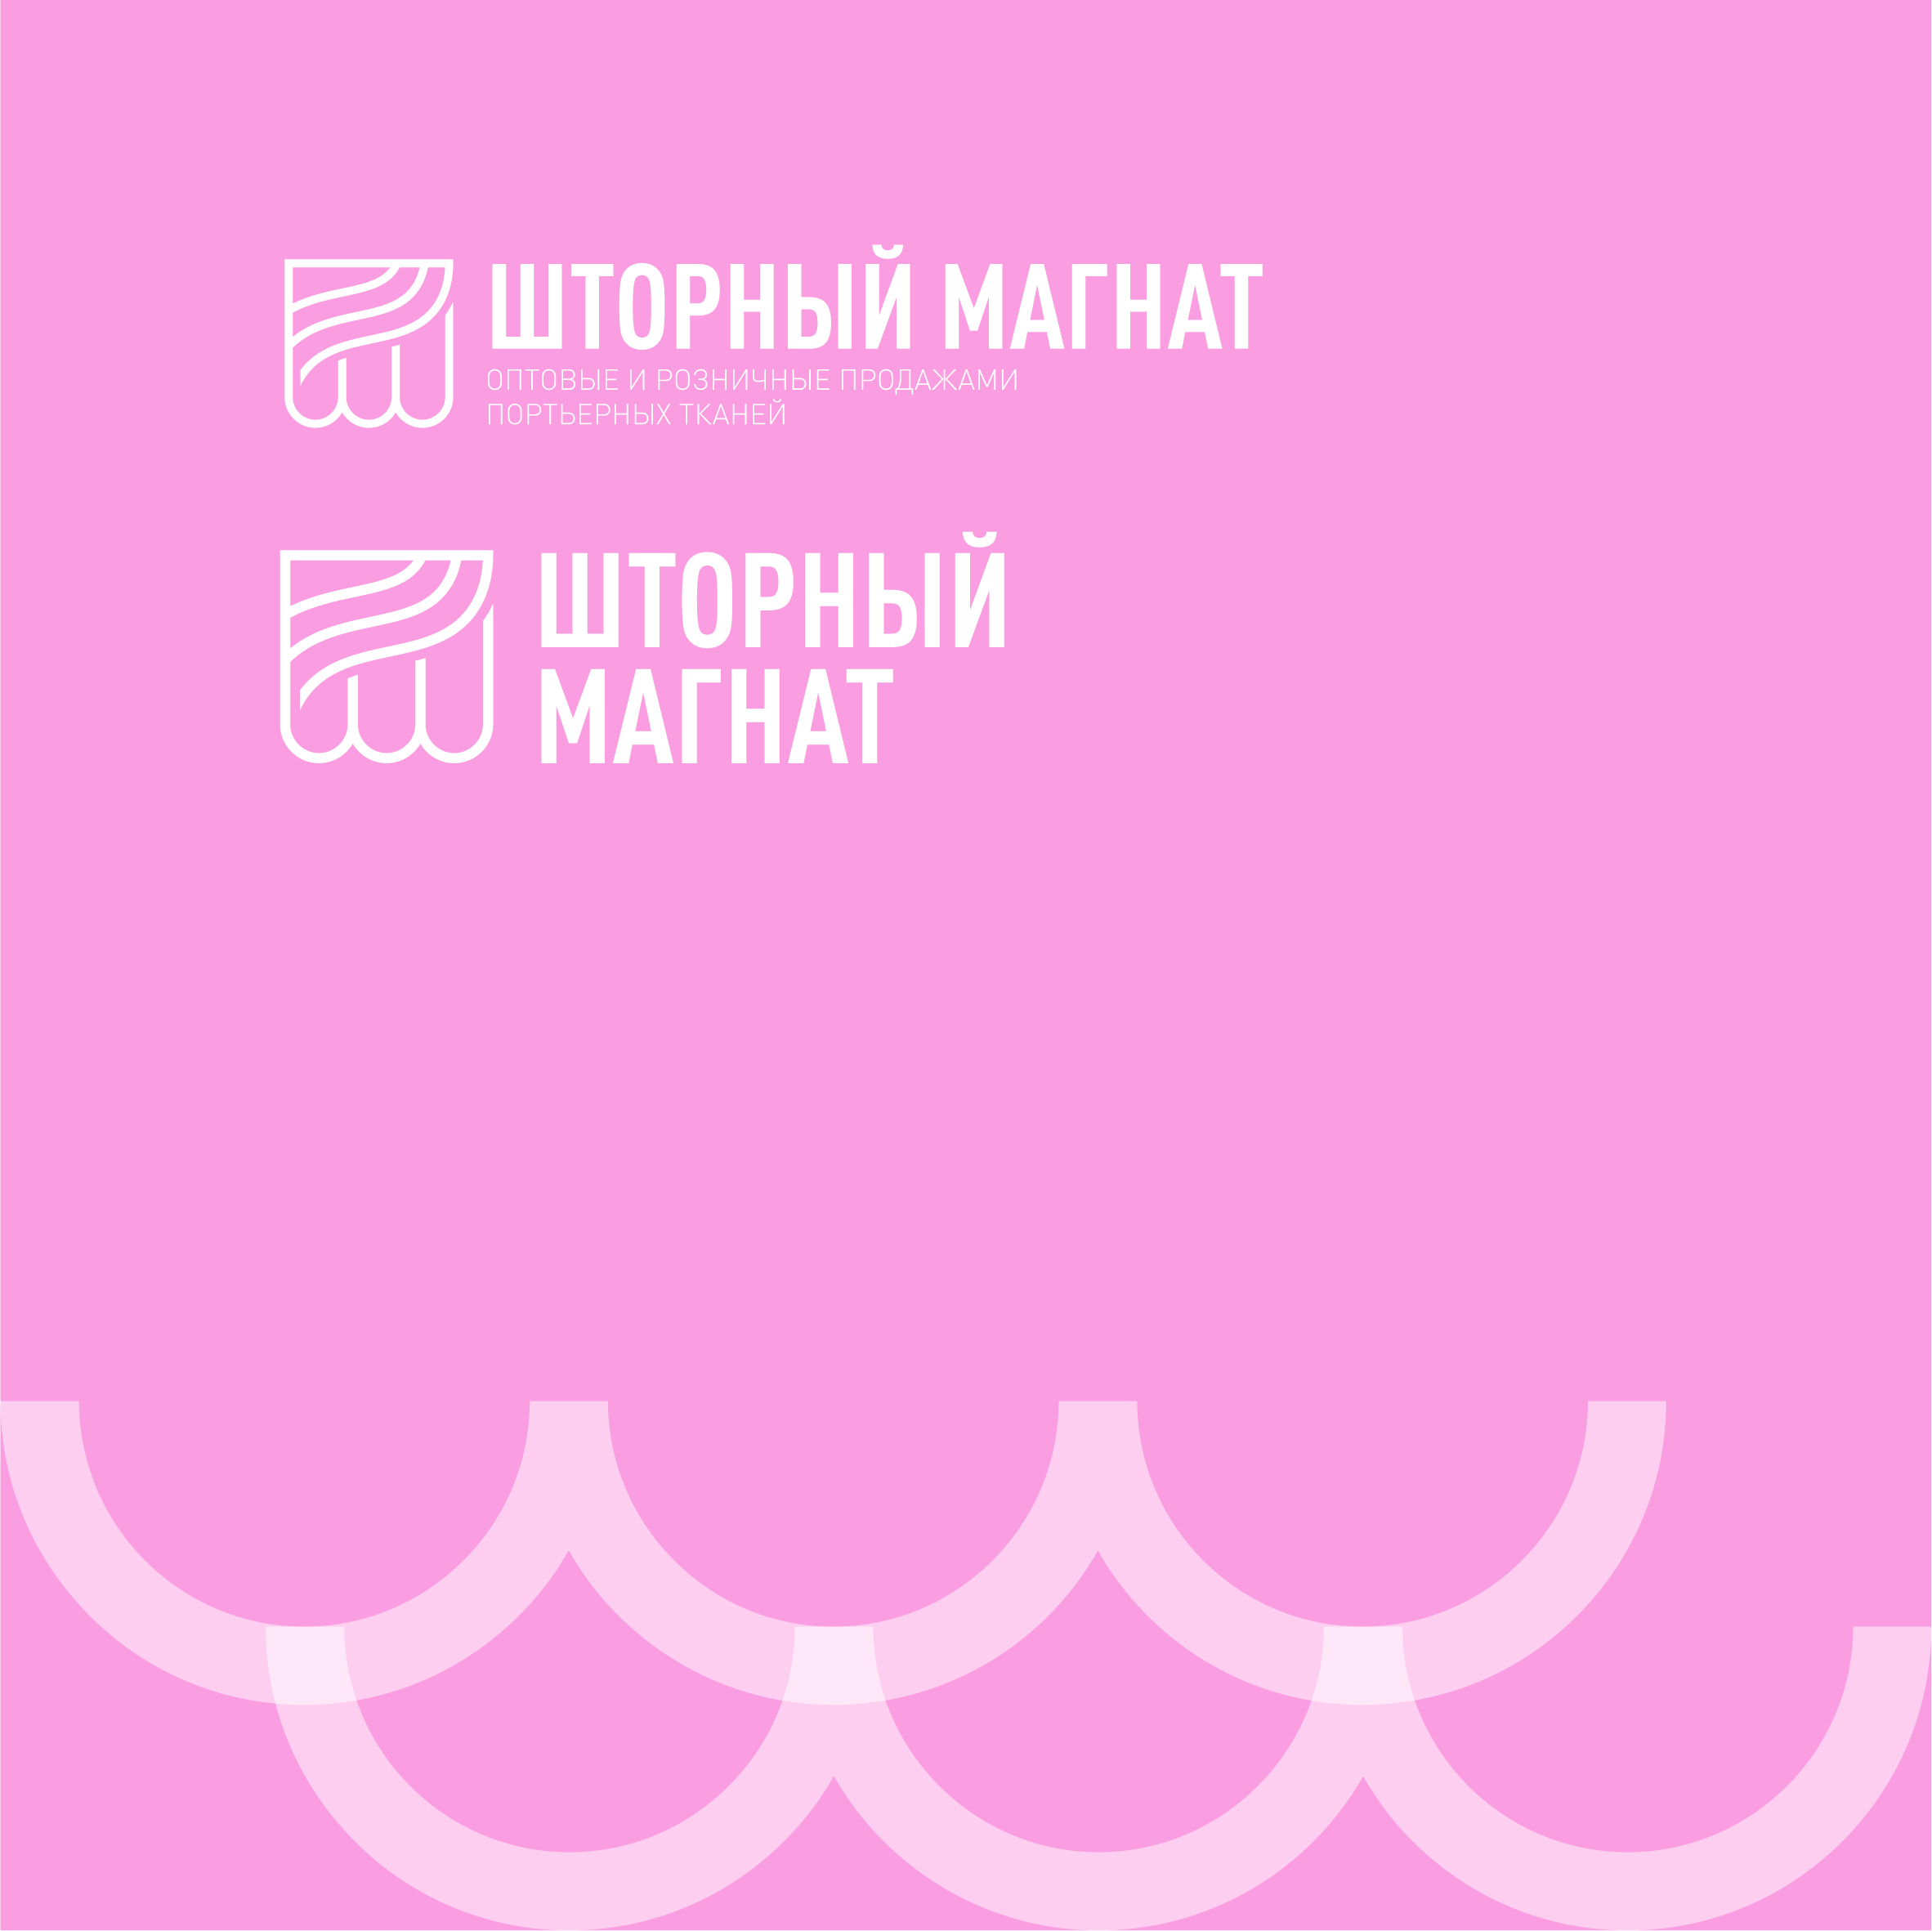 Логотип и фирменный стиль для магазина тканей. фото f_2265cd94b7b764d8.jpg